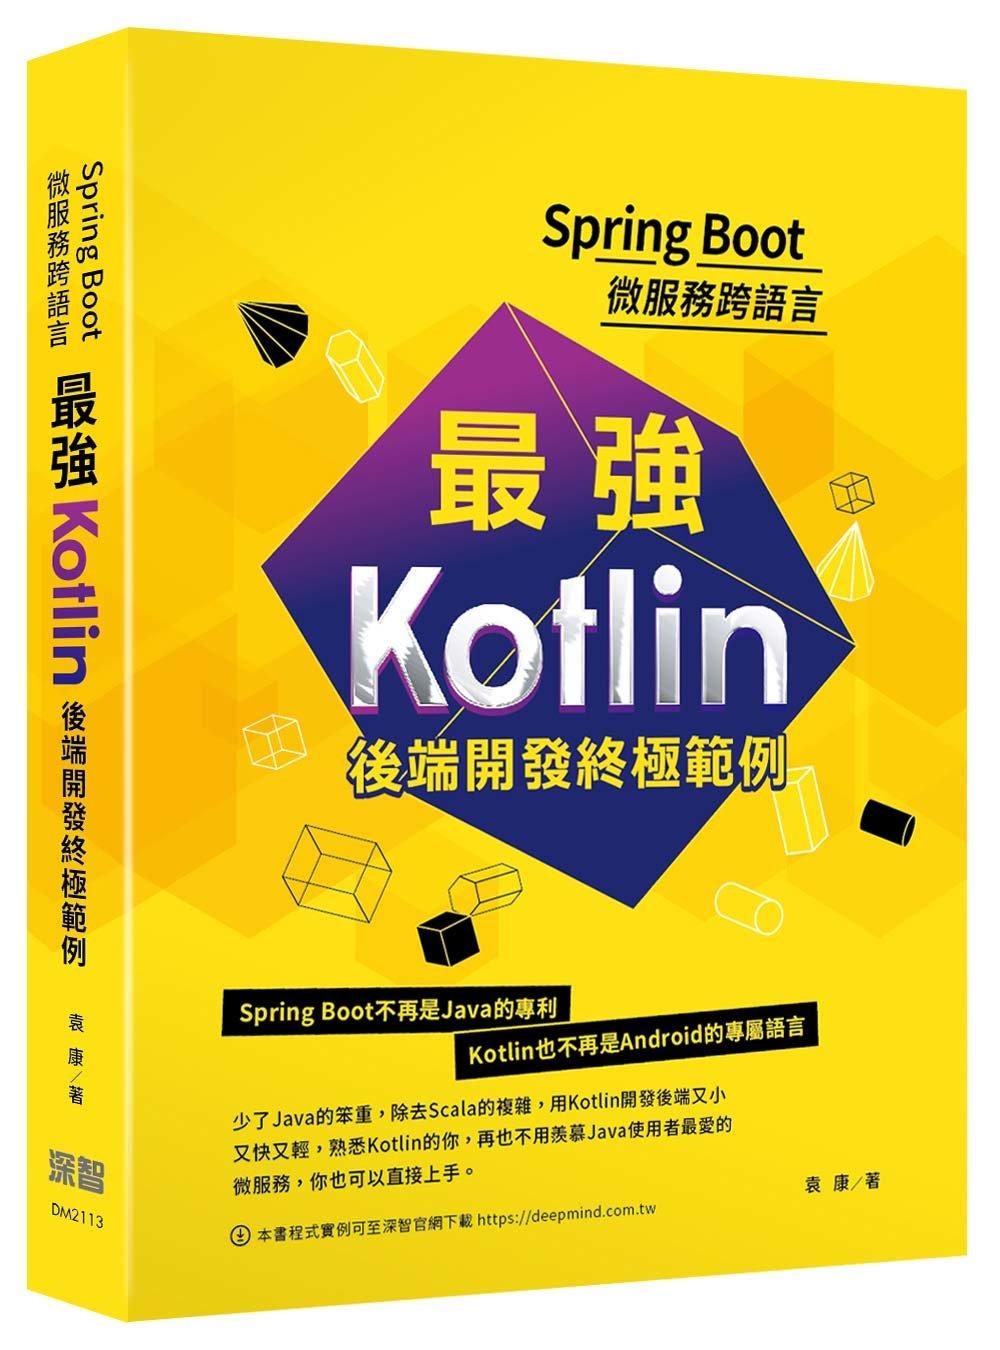 Spring Boot 微服務跨語言:最強 Kotlin 後端開發終極範例-preview-1